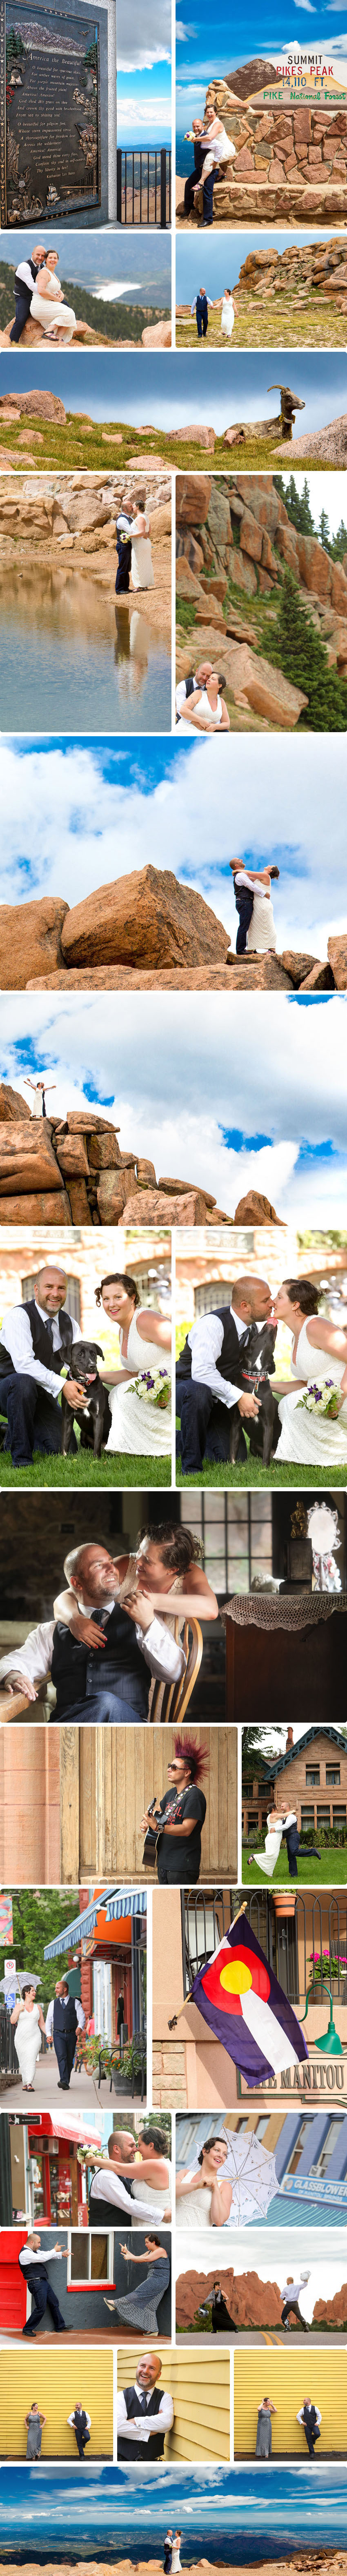 16_Destination wedding videography